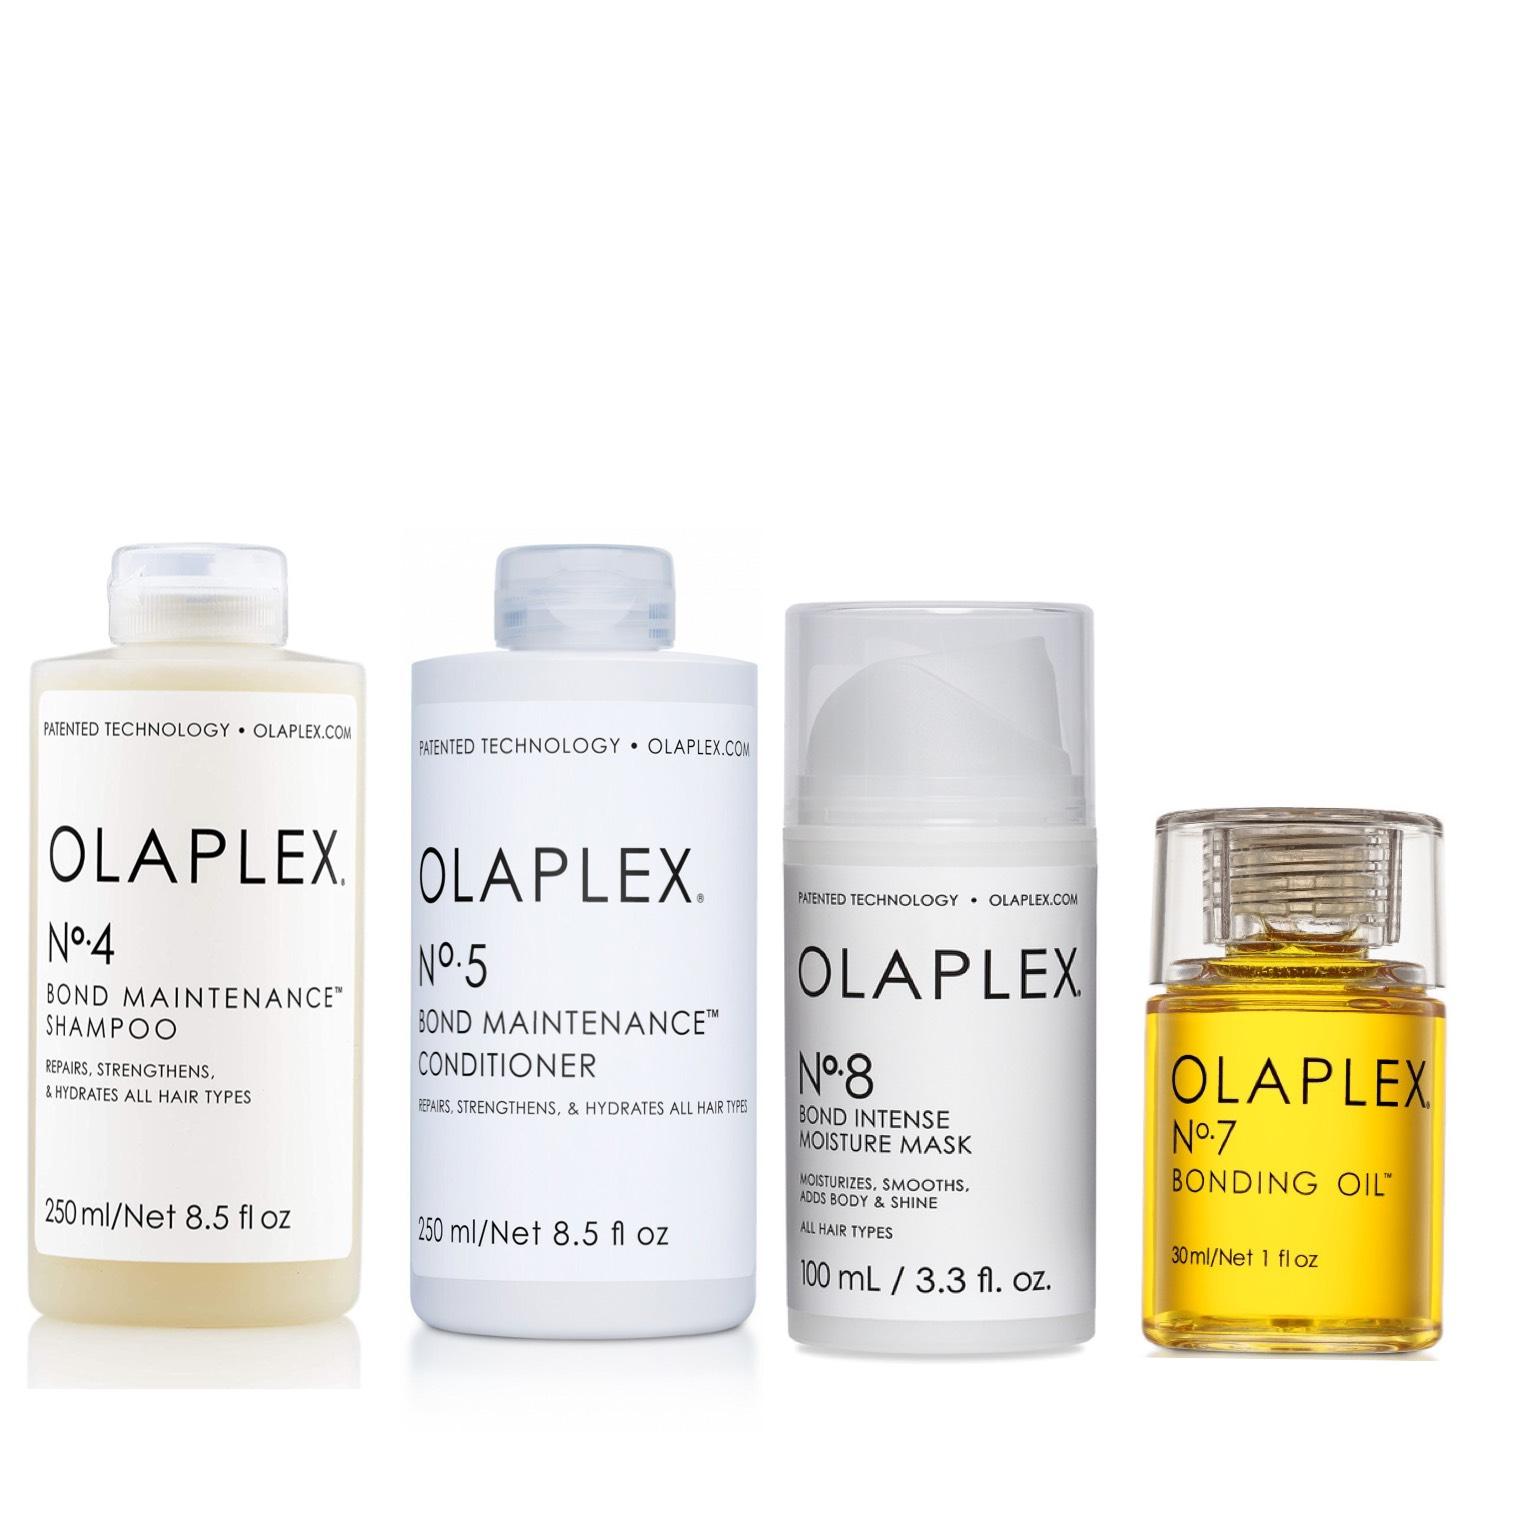 Olaplex Set - Olaplex No 4 Bond Maintenance Shampoo 250ml + Olaplex No 5 Bond Maintenance Conditioner 250ml + Olaplex No 8 Bond Intense Moisture Mask 100ml + Olaplex No 7 Bonding Oil 30ml